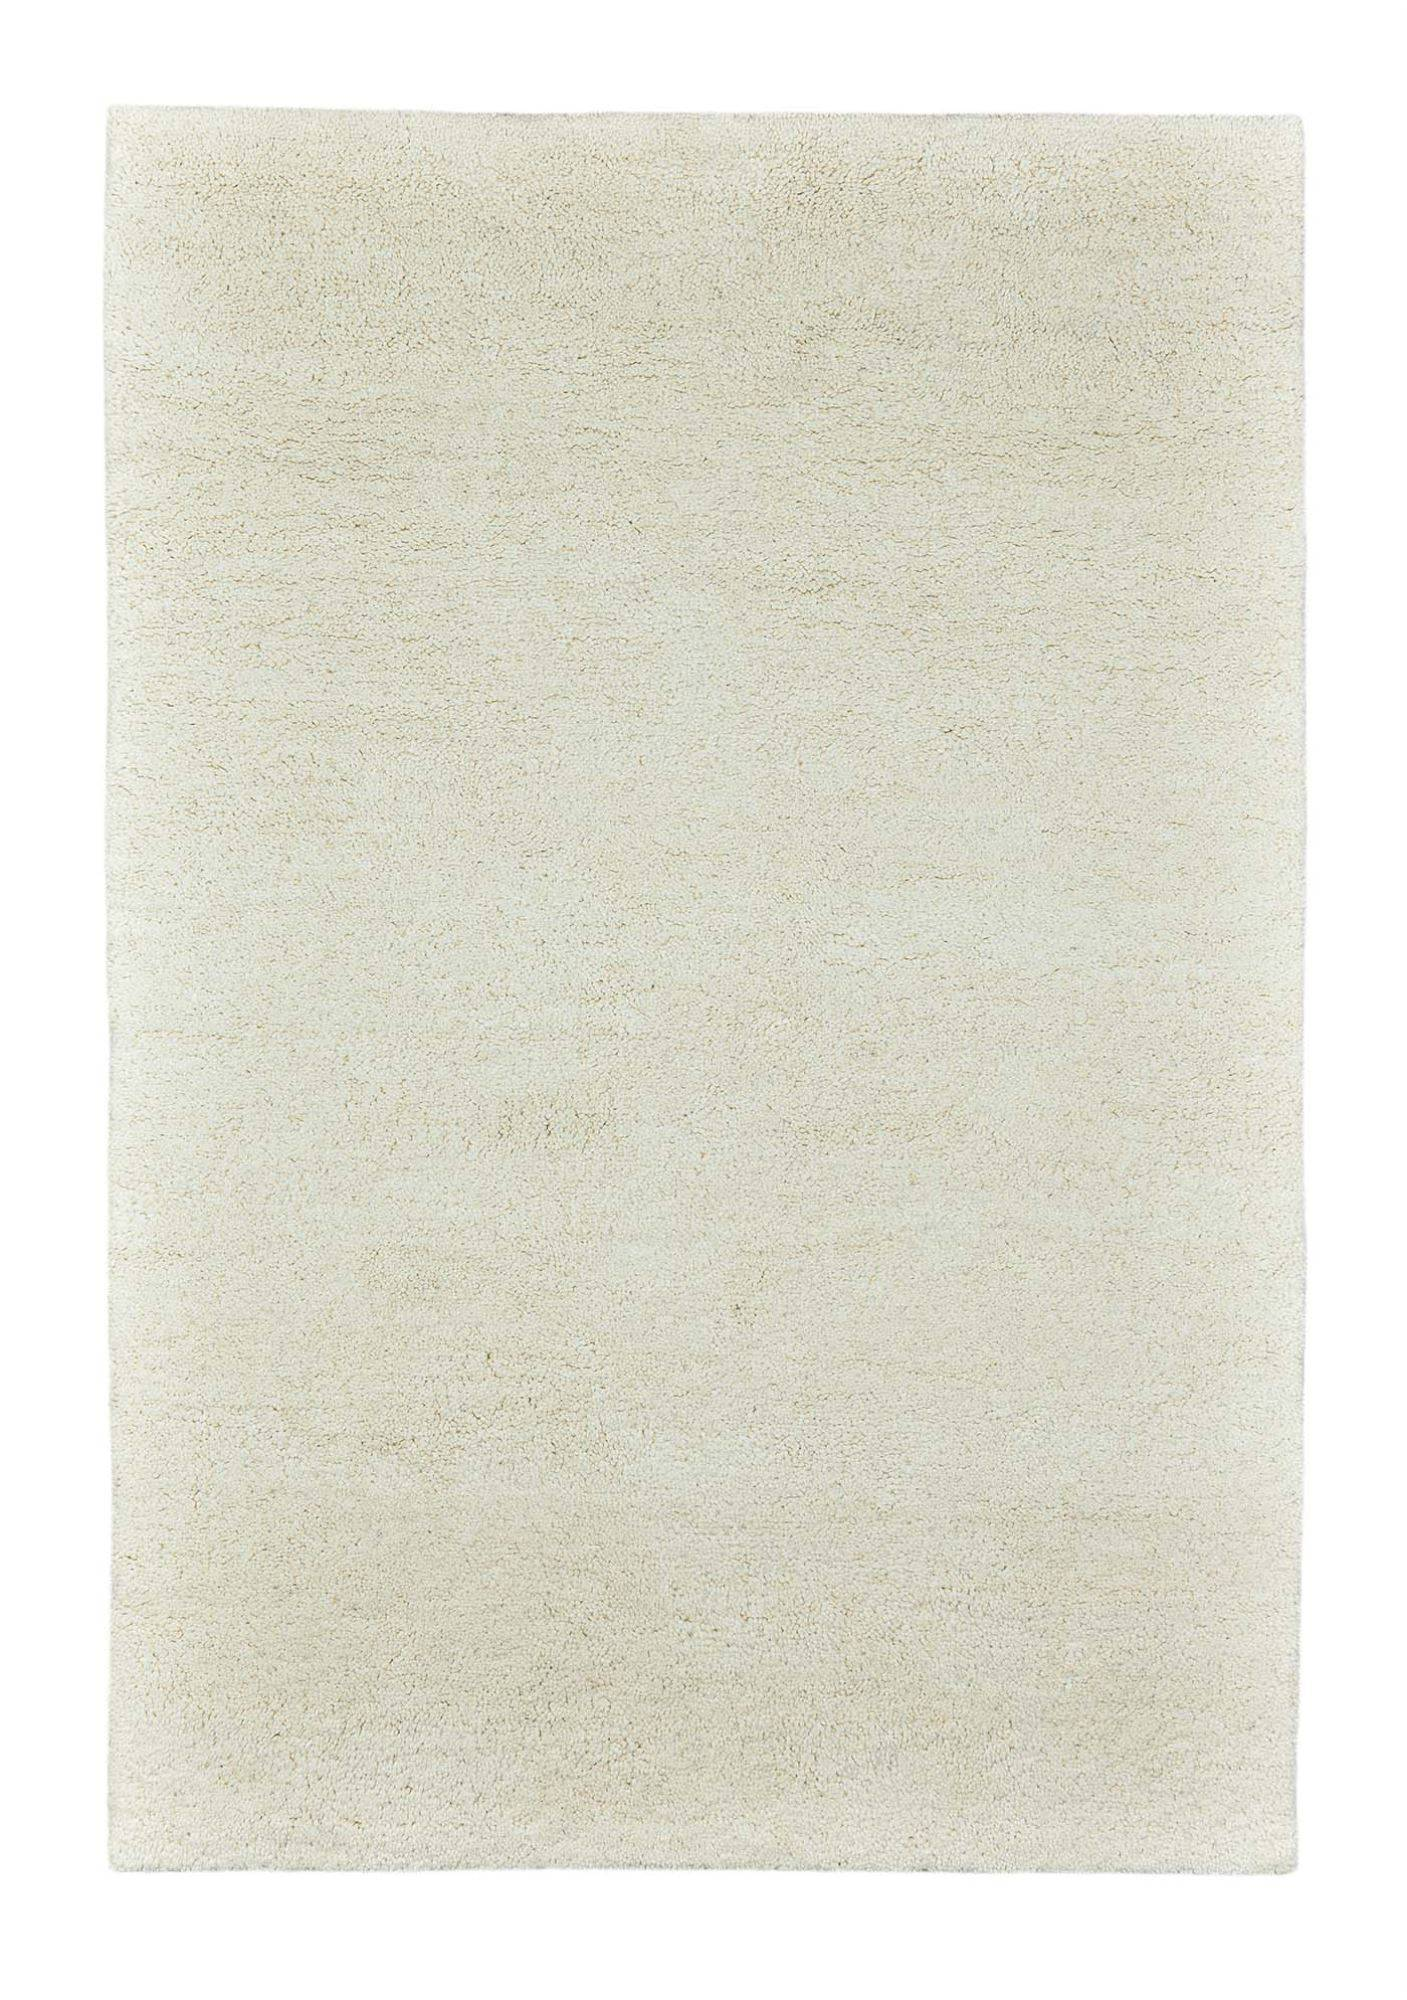 THEKO Tapis berber du maroc en laine naturelle Blanc 60x120